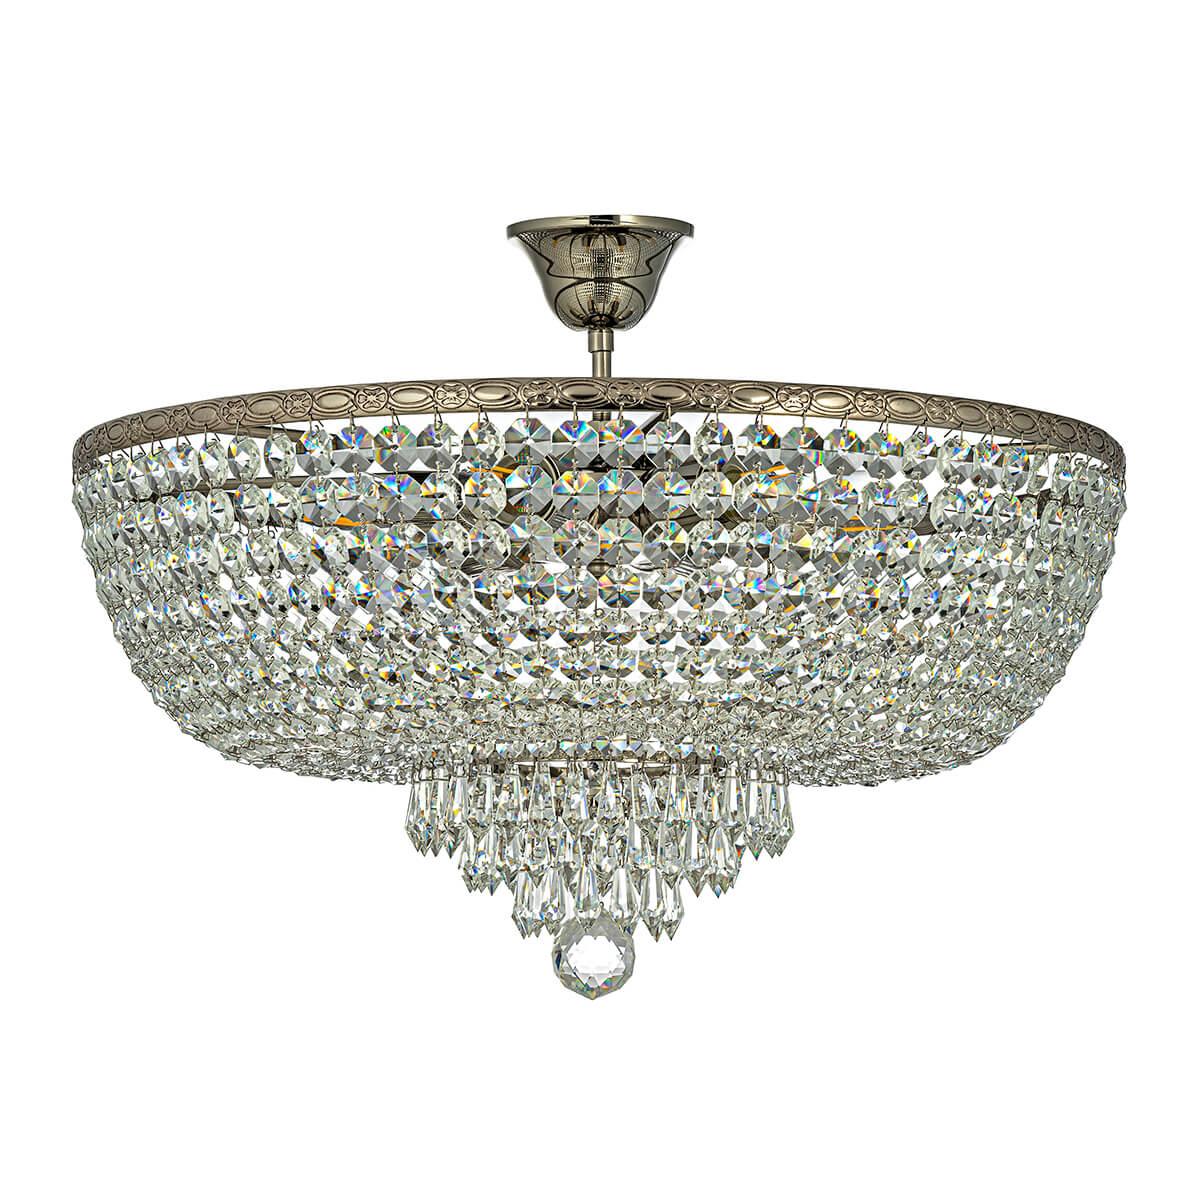 Потолочный светильник Arti Lampadari Nonna E 1.3.50.503 N цена и фото